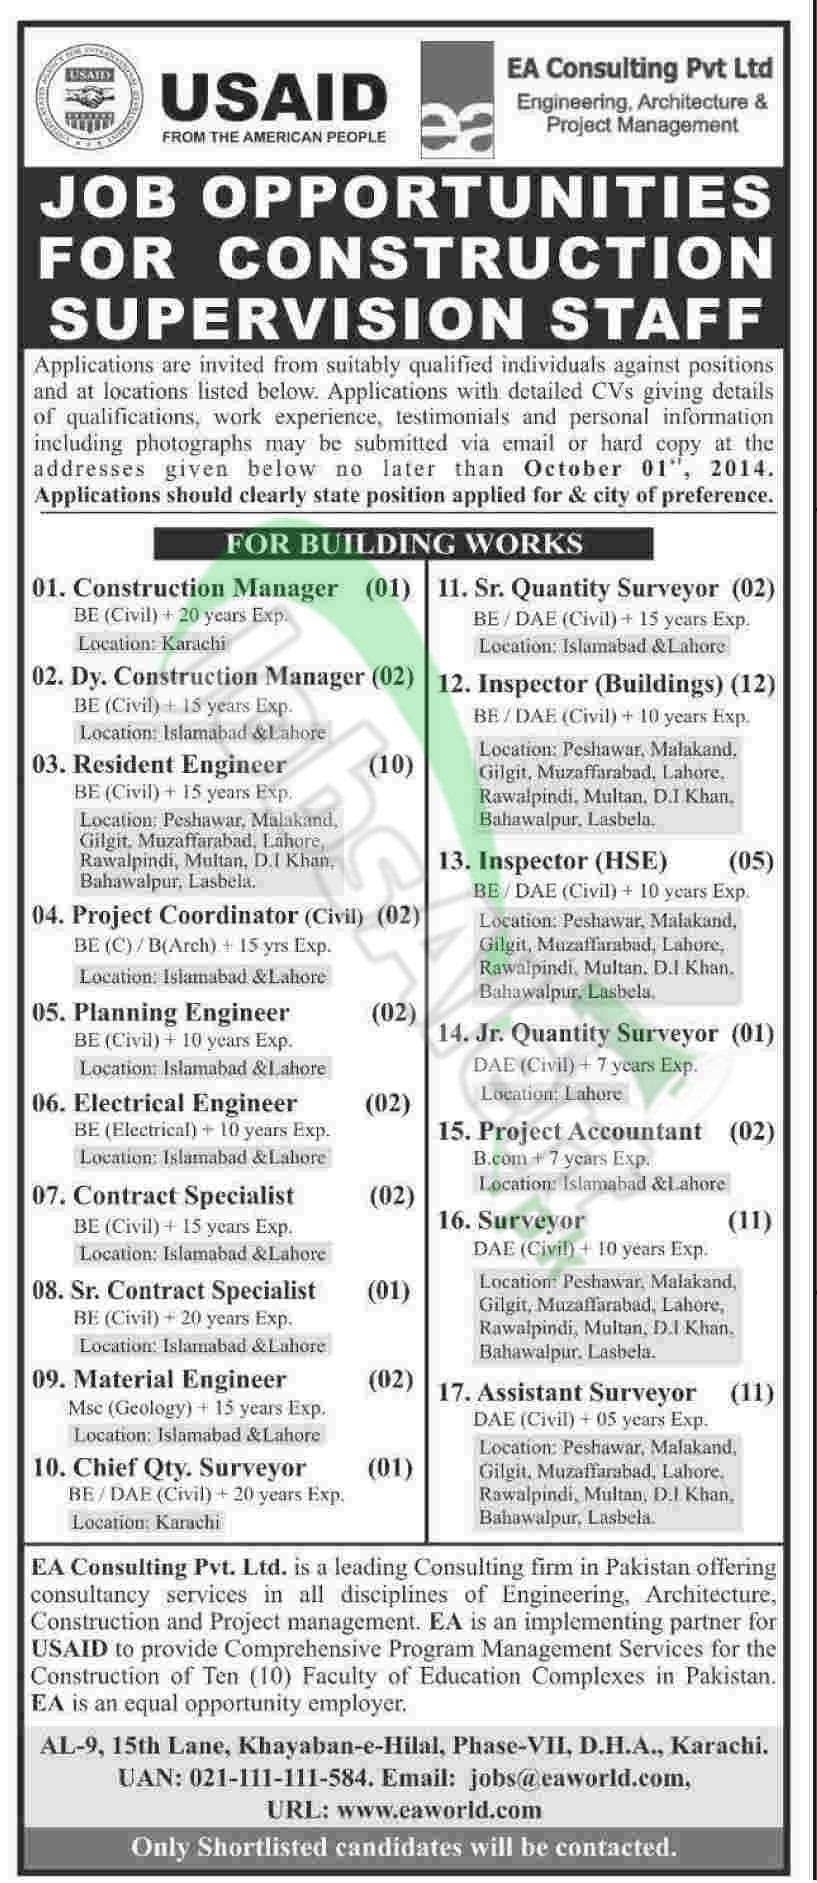 USAID & EA Consulting Pvt Ltd